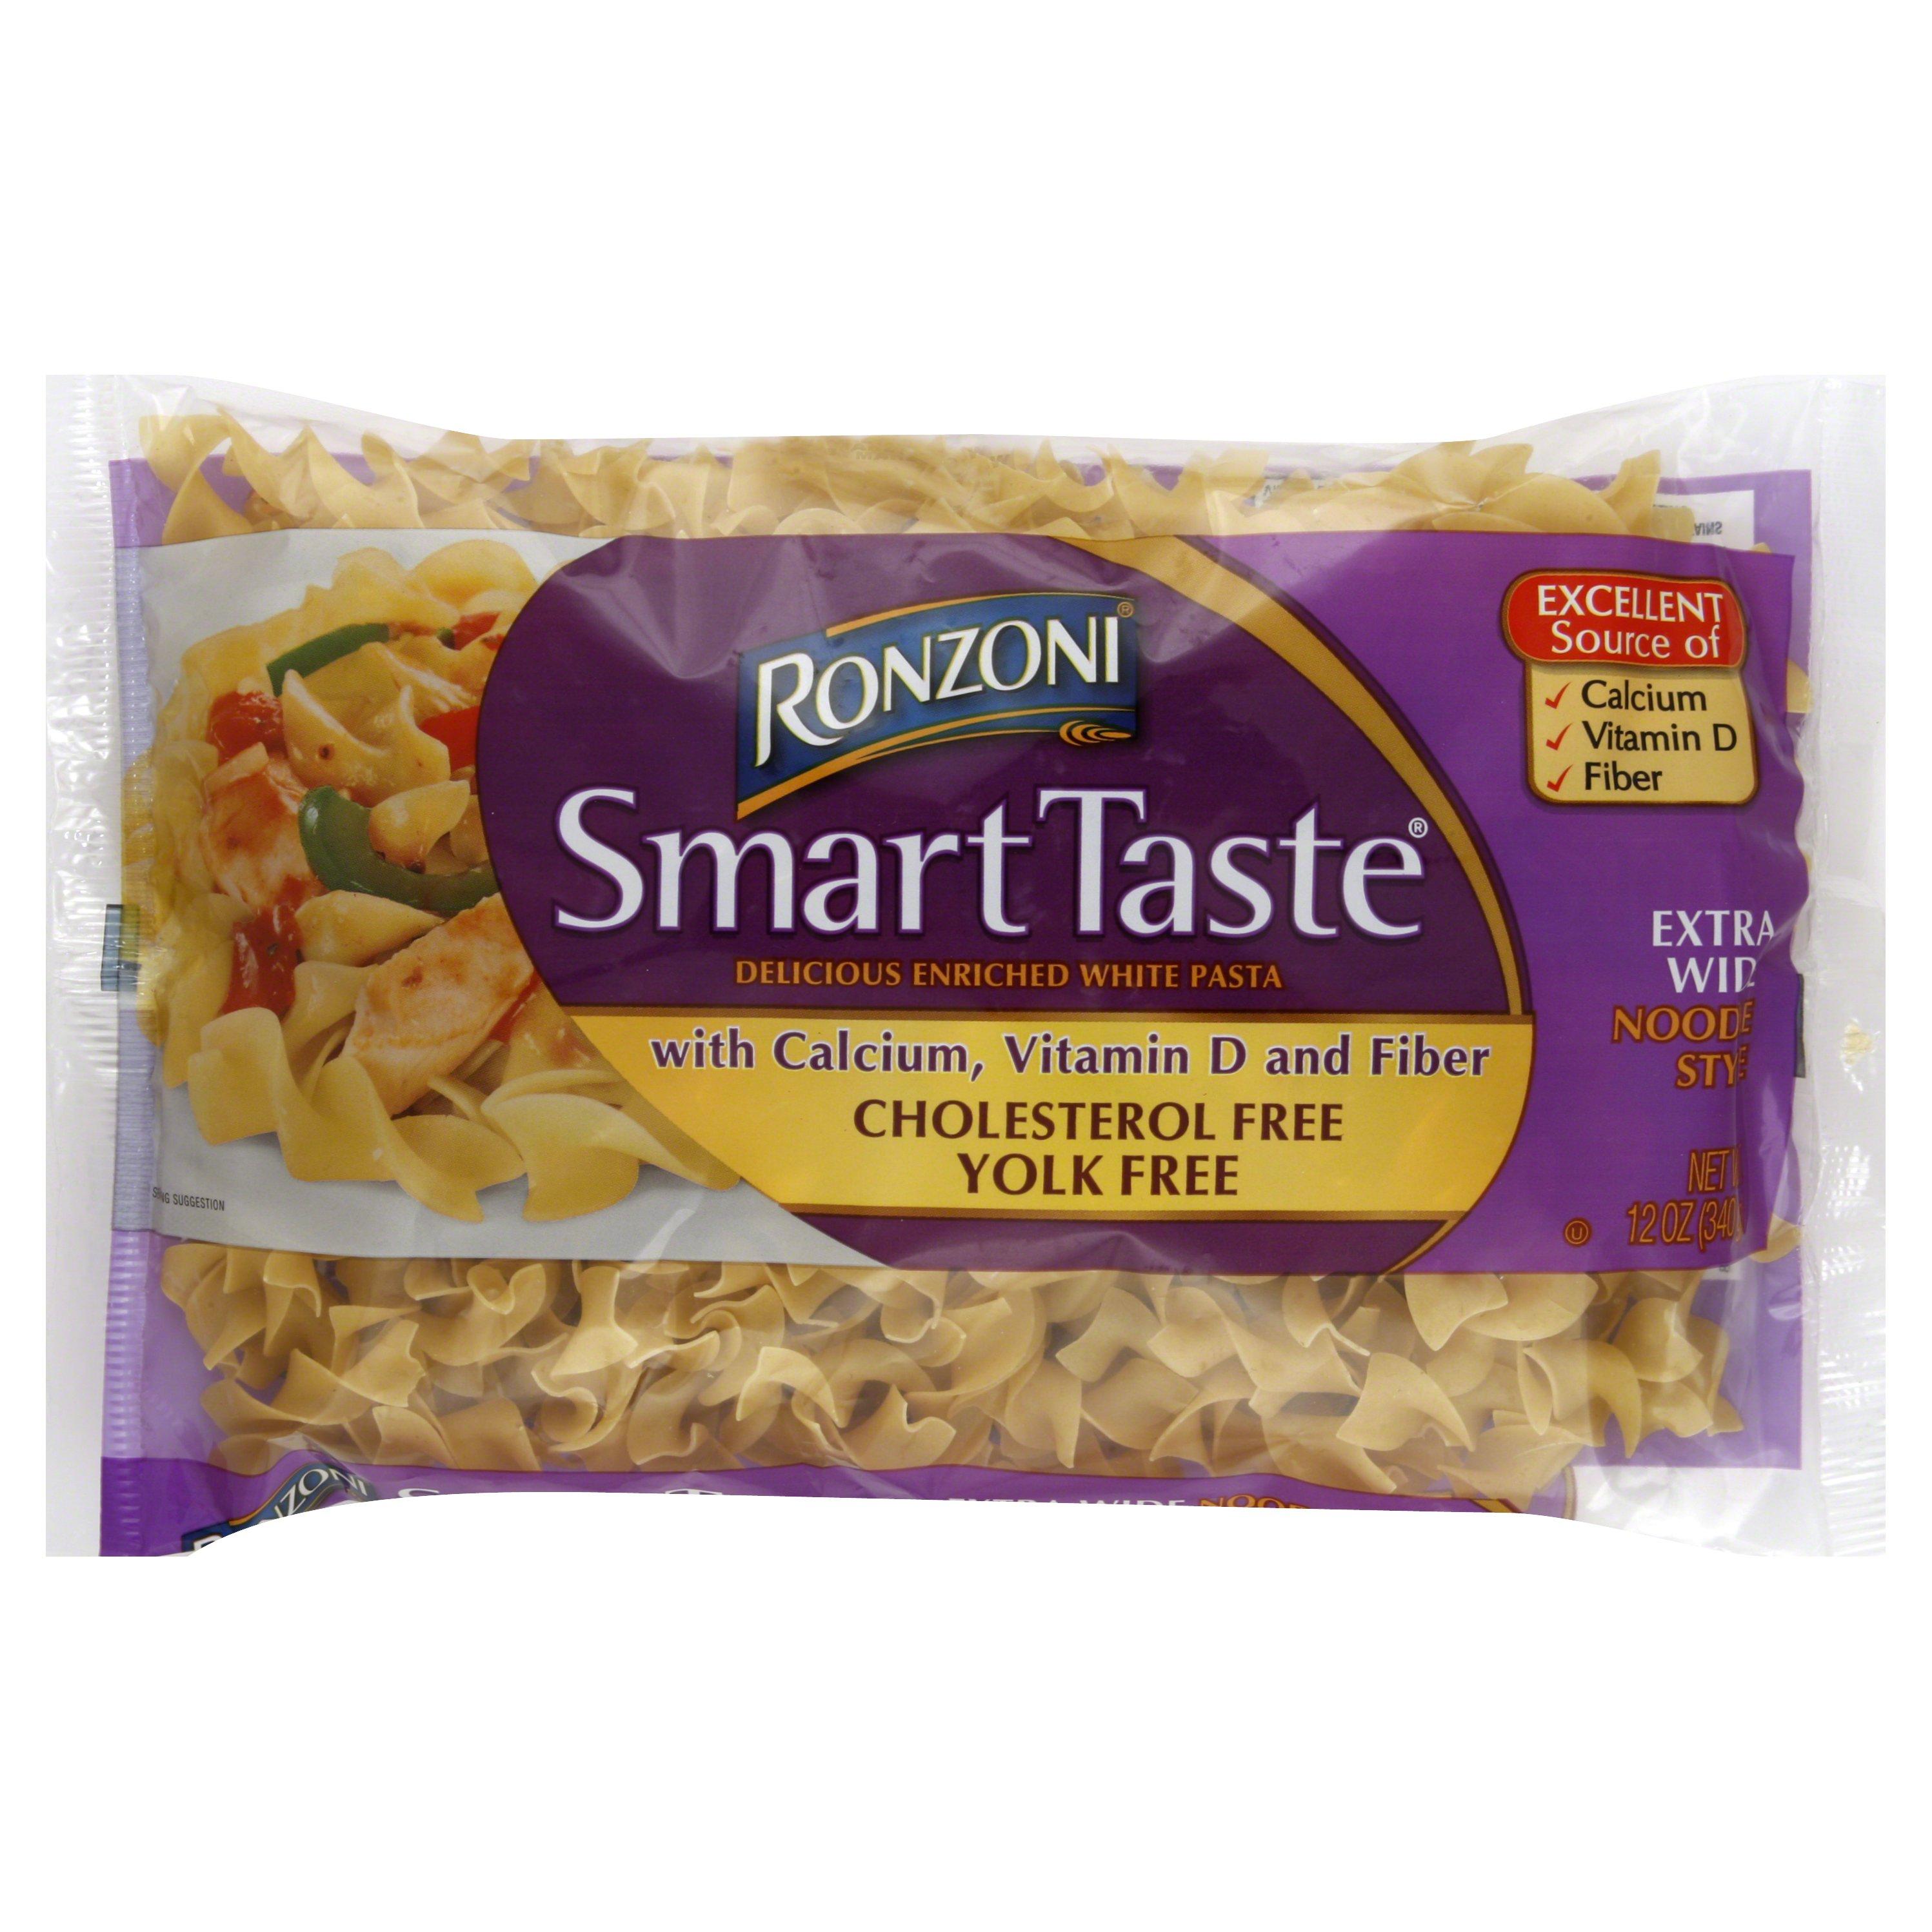 Ronzoni Smart Taste Extra Wide Noodle Style 12OZ 12-Pack